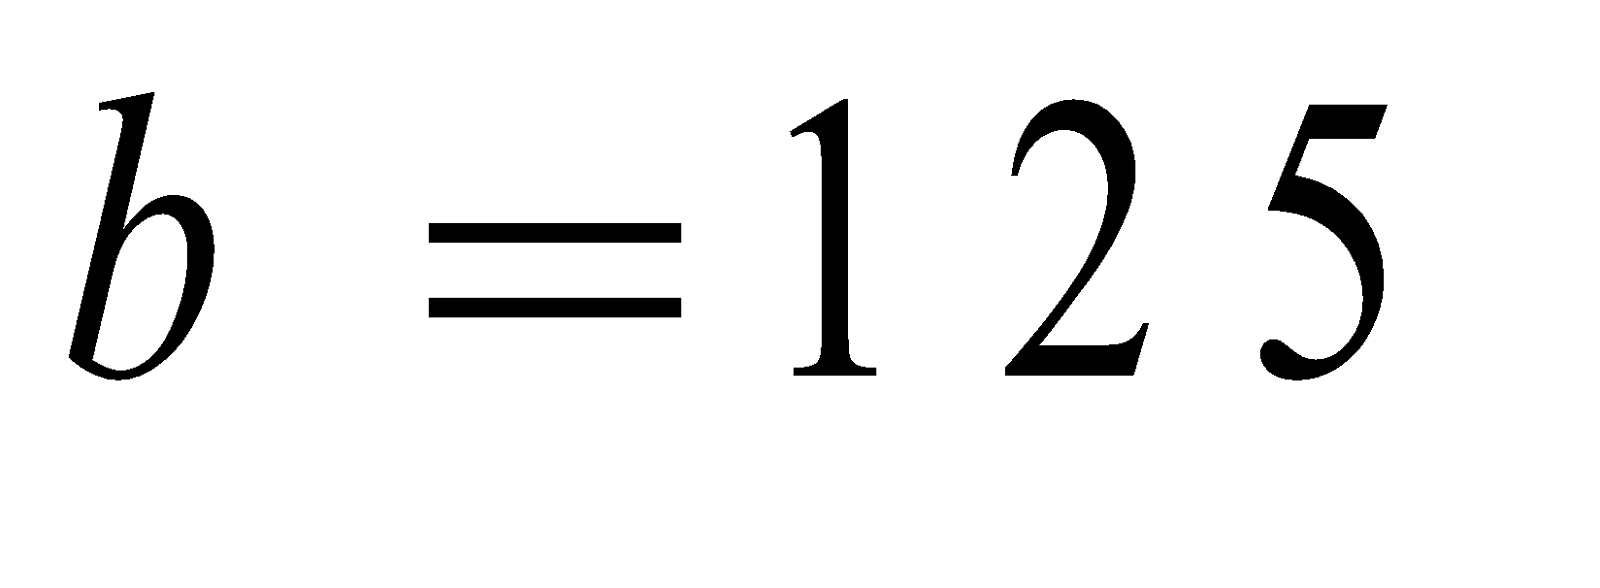 image74.png